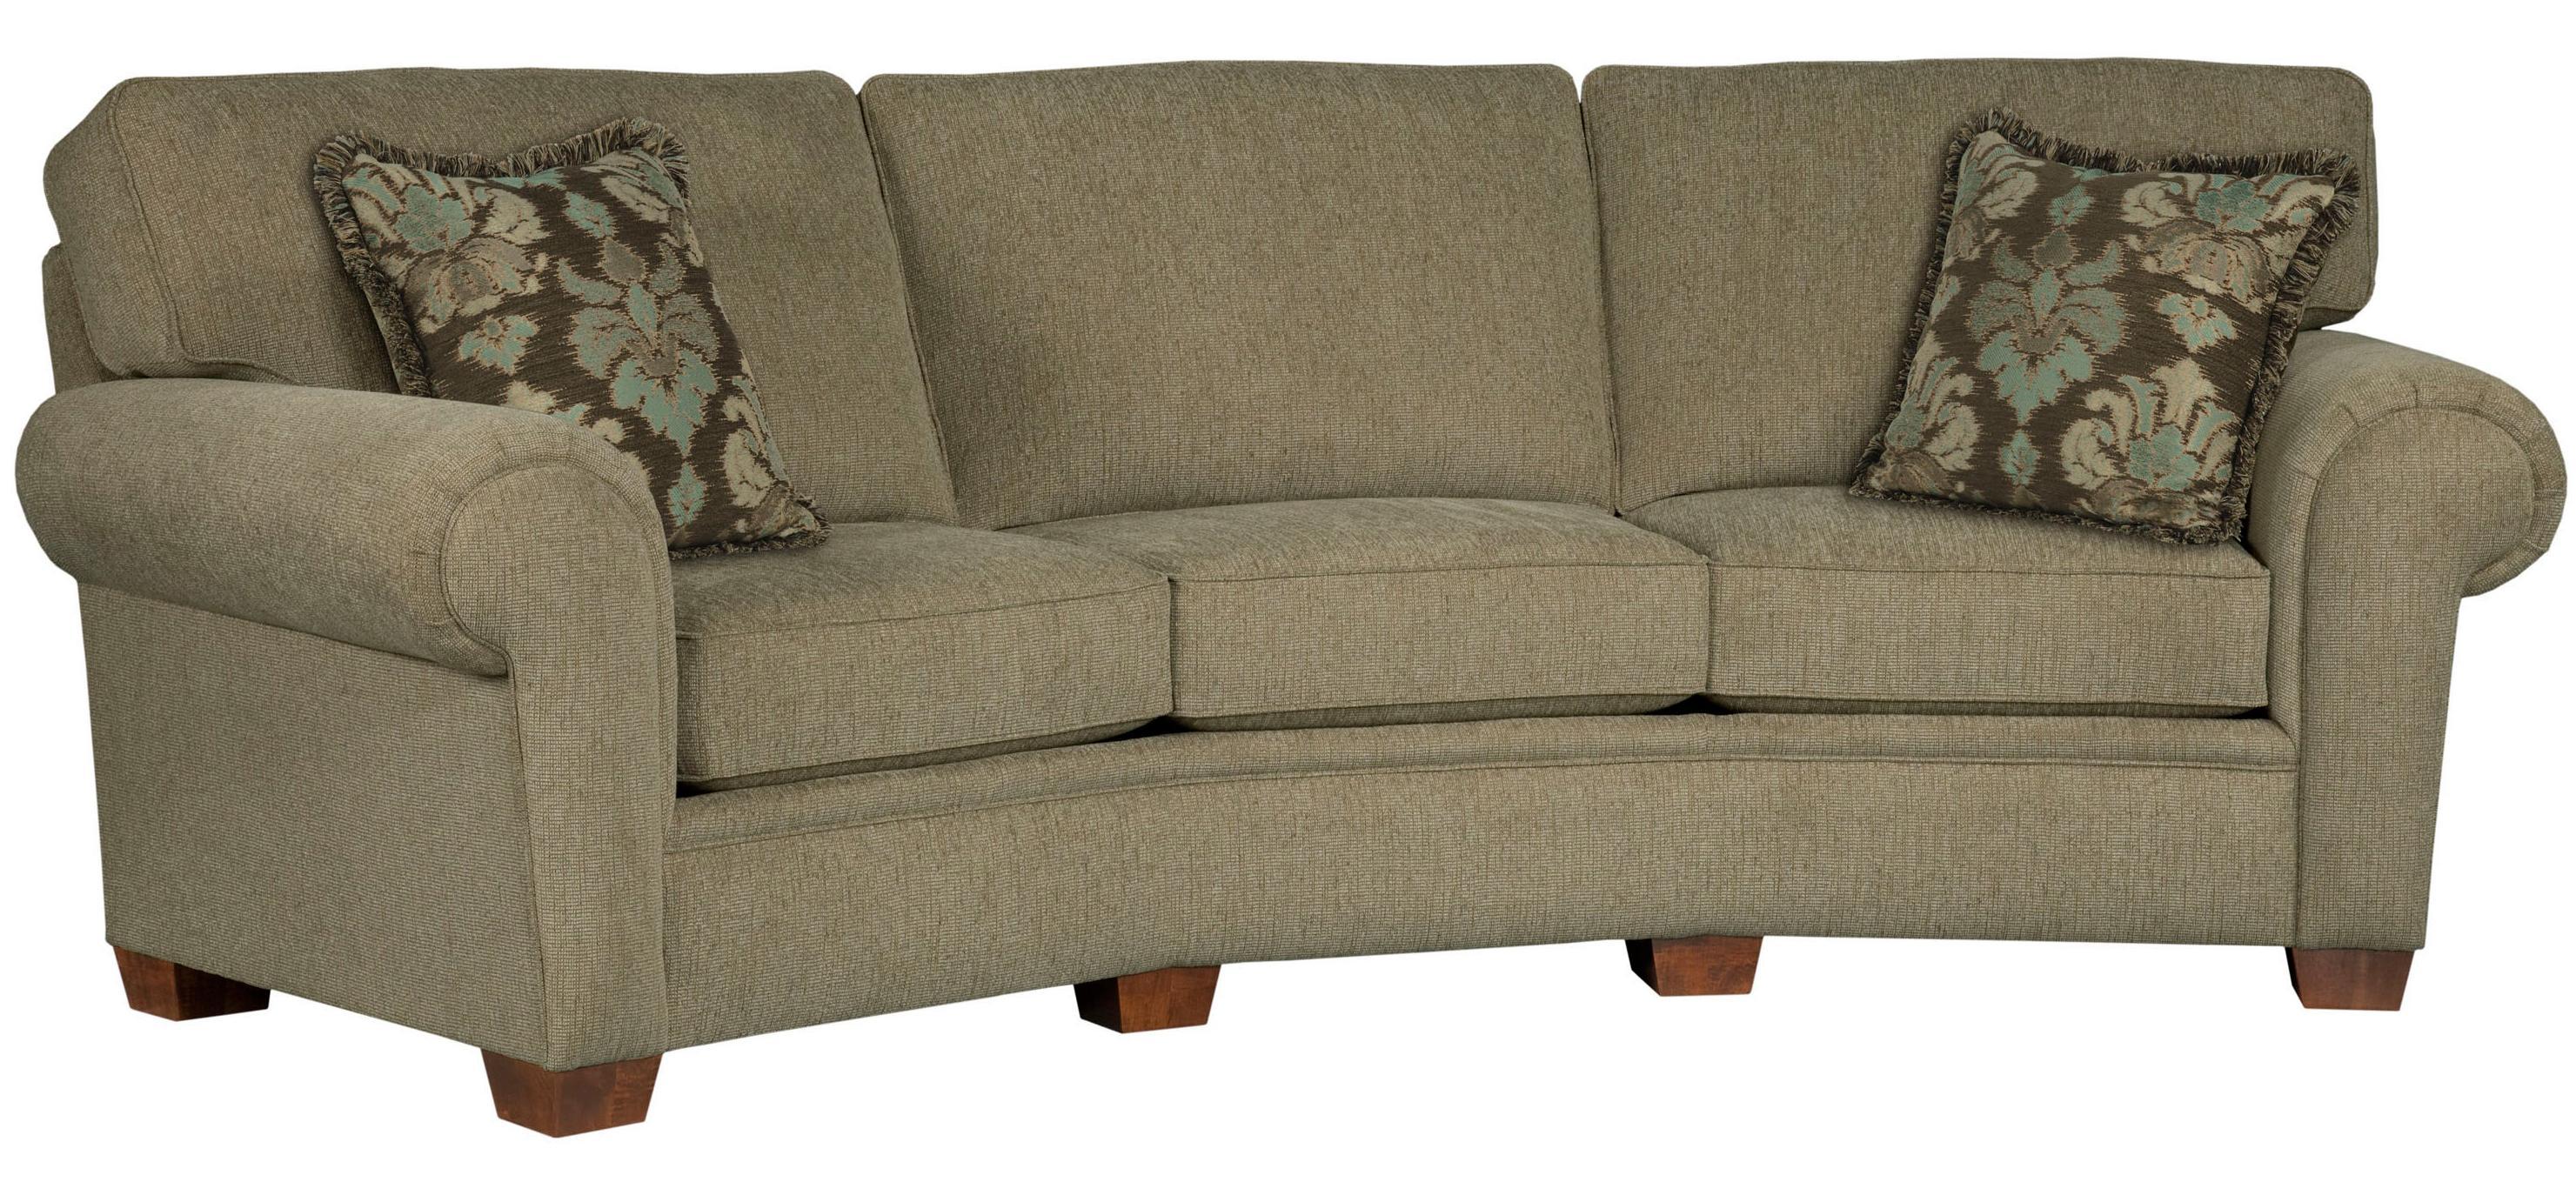 broyhill laramie sofa fabric sleeper sofas queen conversation home the honoroak